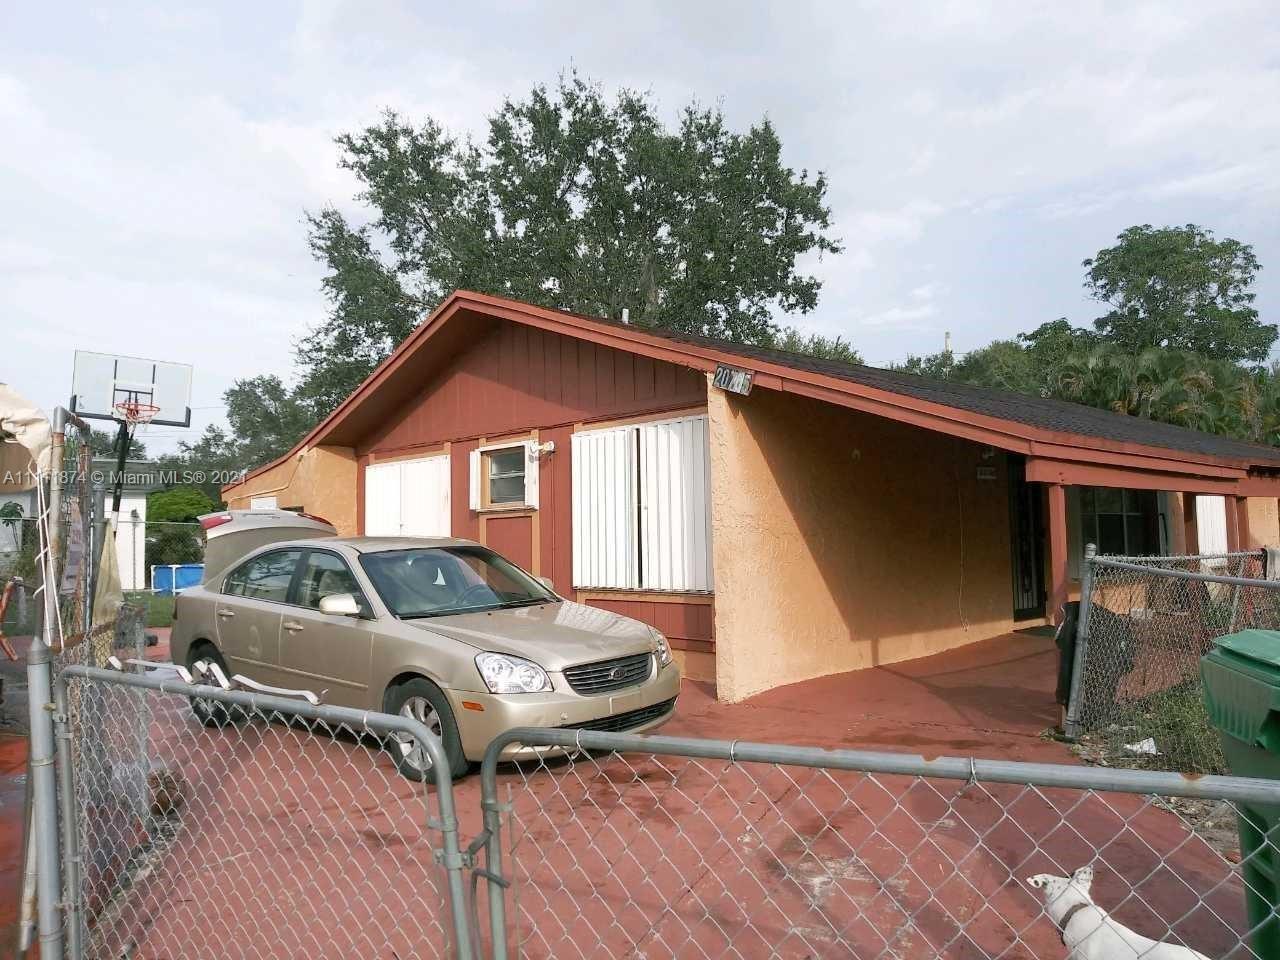 20765 NW 41st Avenue Rd, Miami Gardens, FL 33055 - #: A11111874